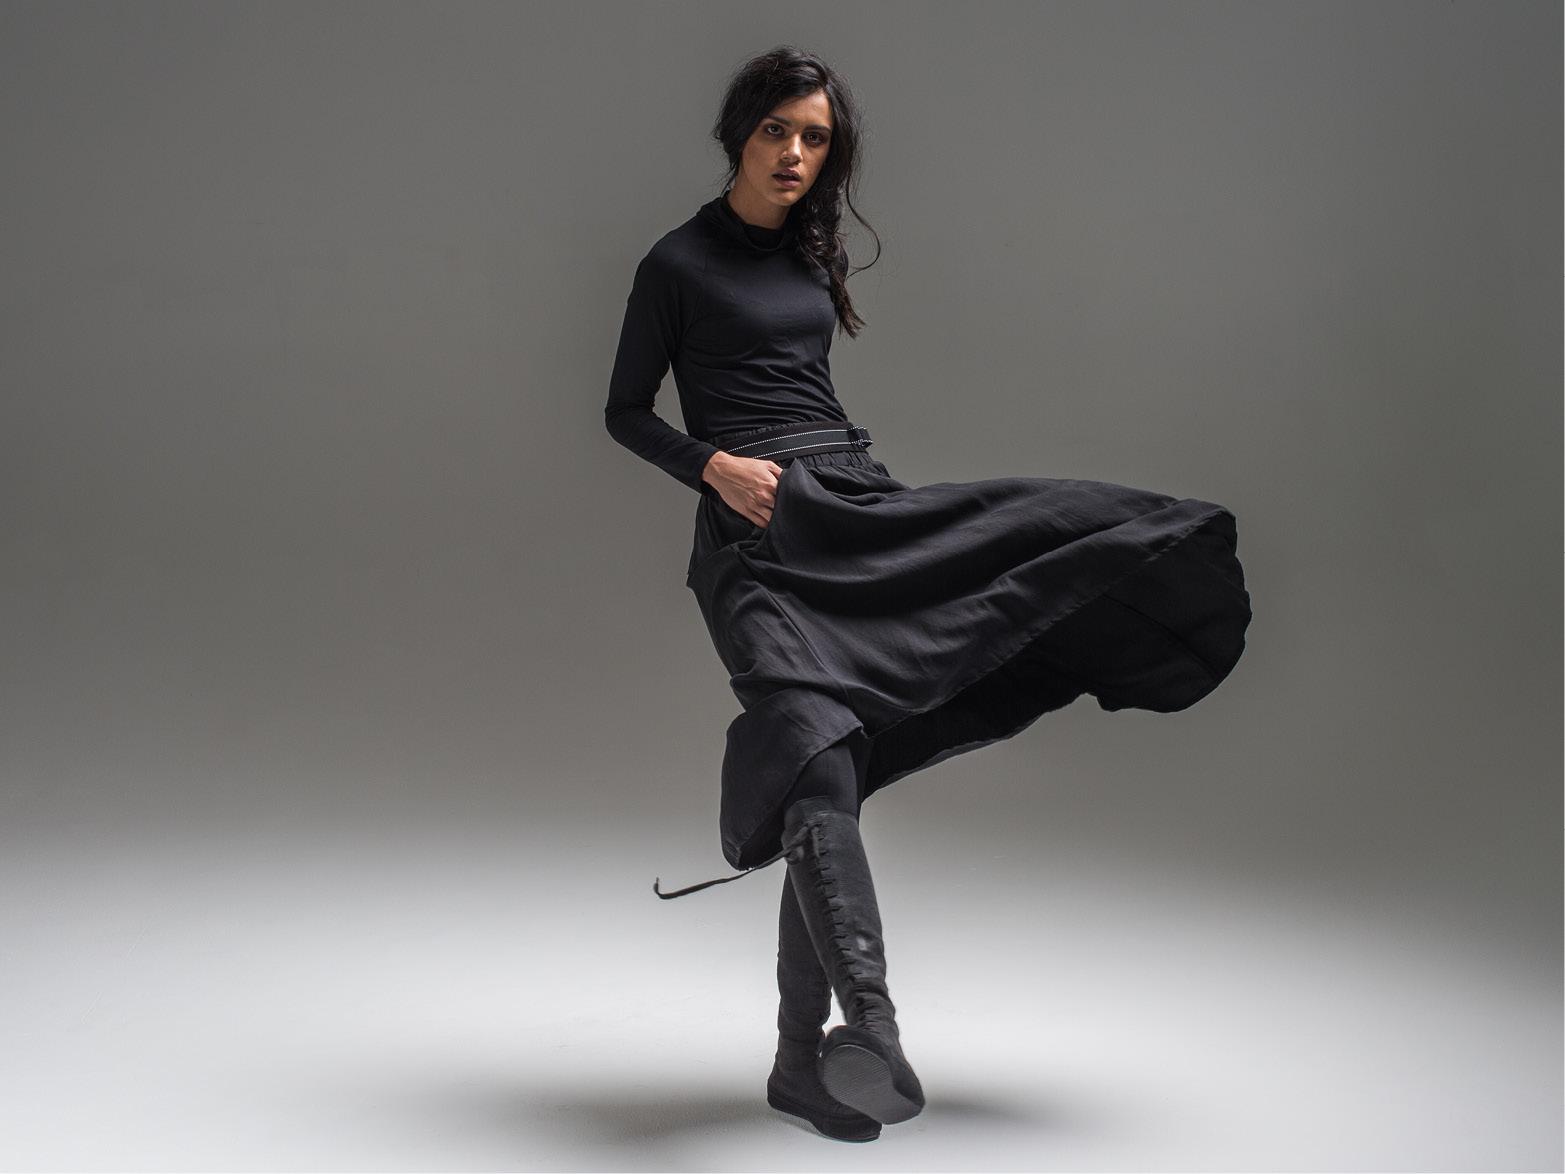 Alex top, Lanky legs, Hook skirt + Pinstripe belt